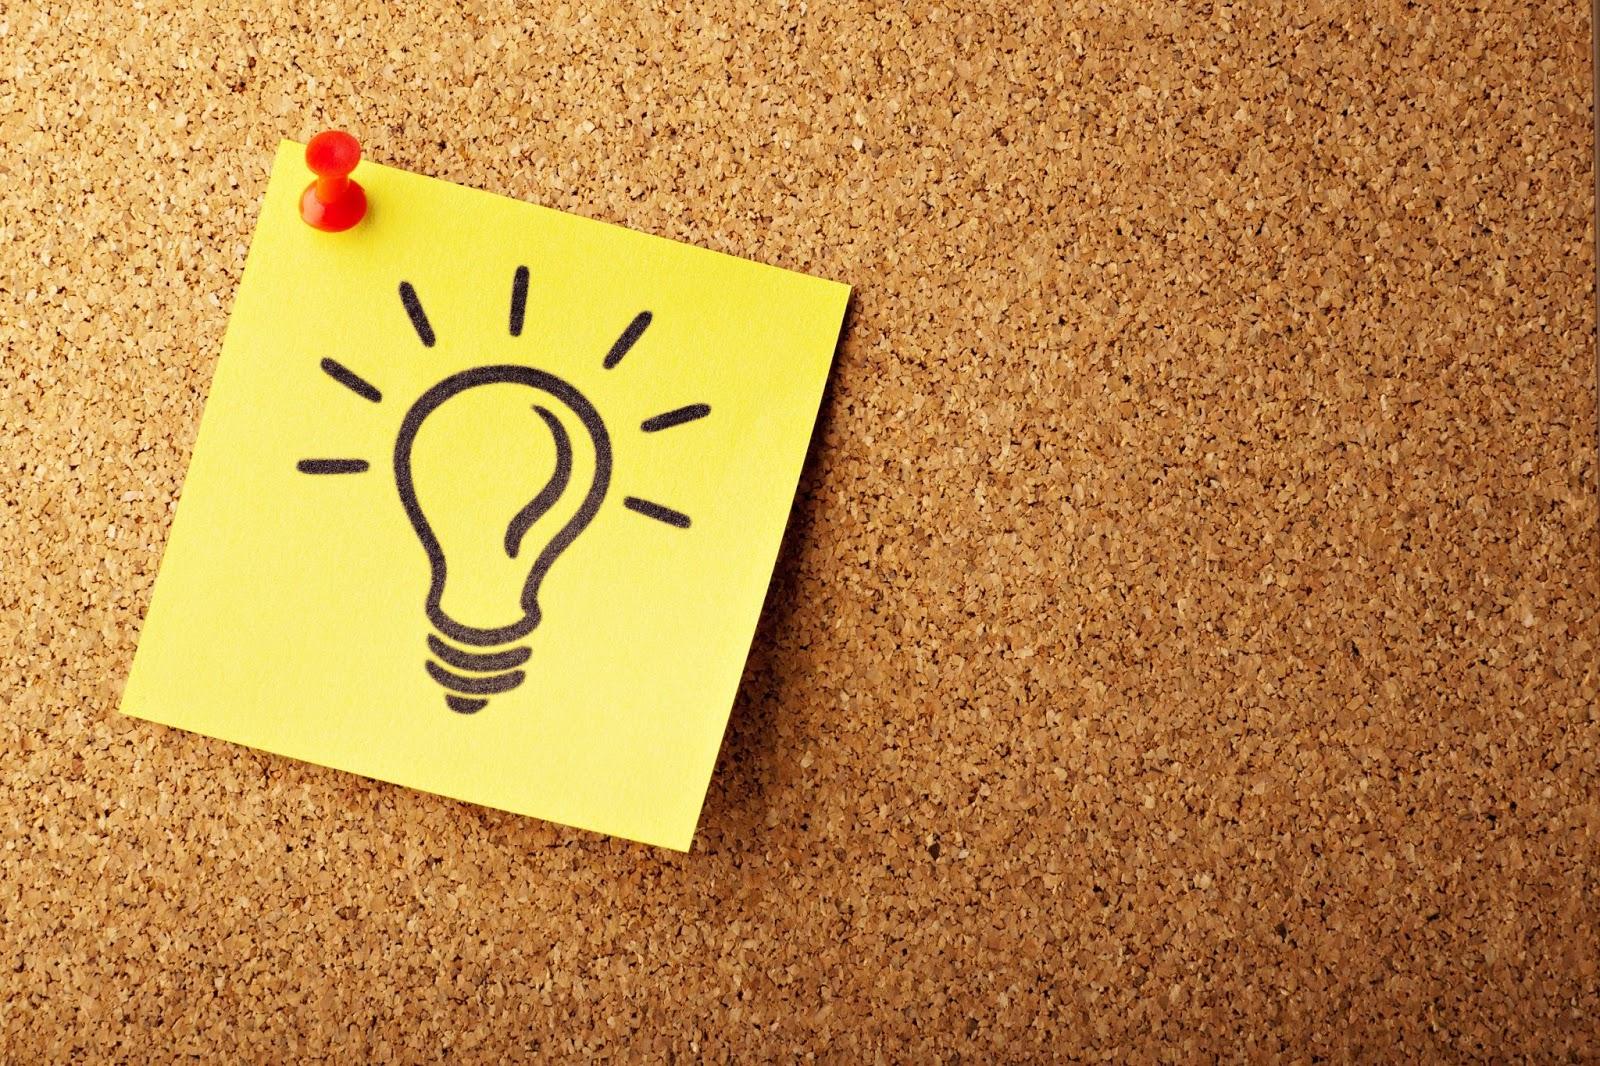 Branding and marketing ideas